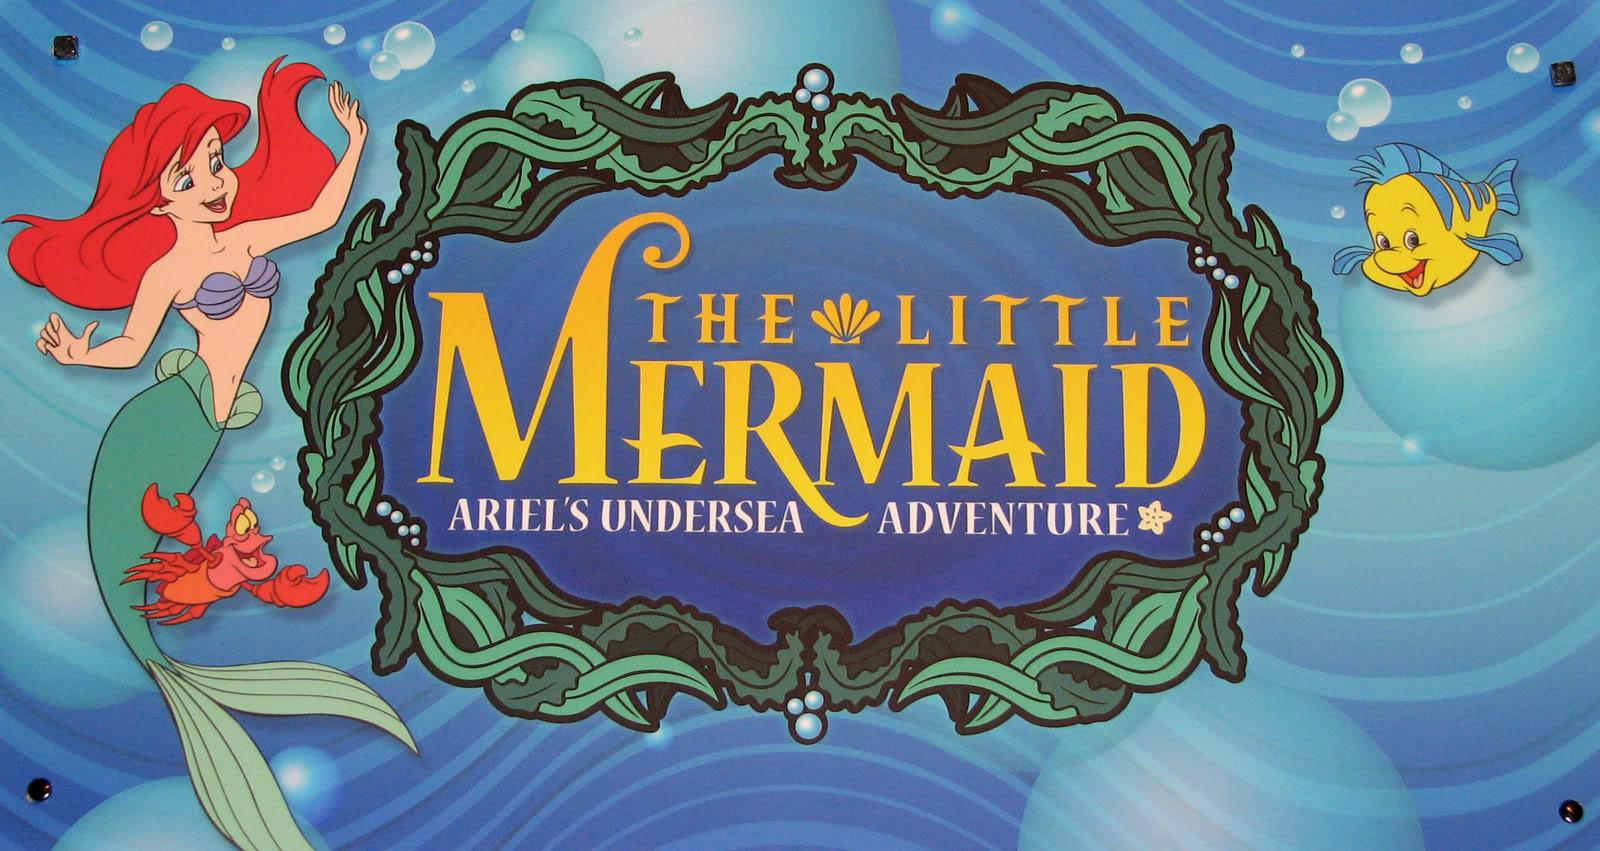 [Disney California Adventure] The Little Mermaid: Ariel's Undersea Adventure (2011) Mermaid0